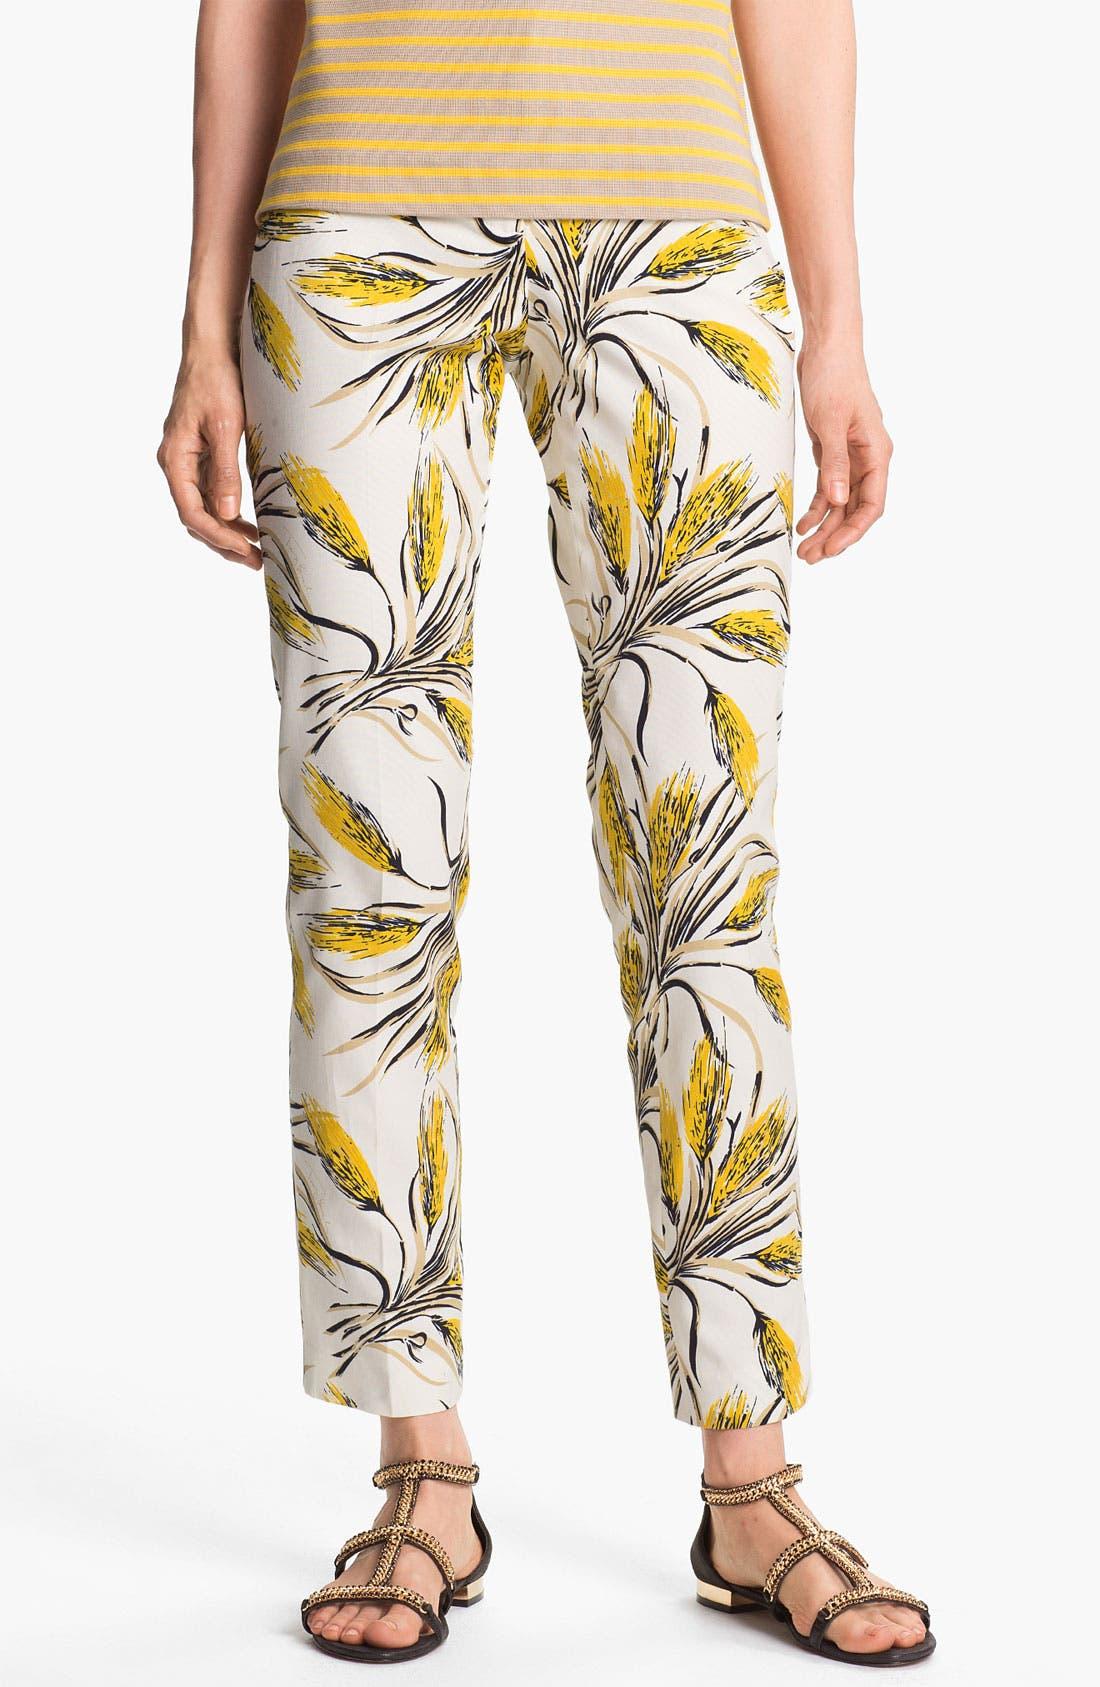 Alternate Image 1 Selected - Tory Burch 'Sullivan' Print Pants